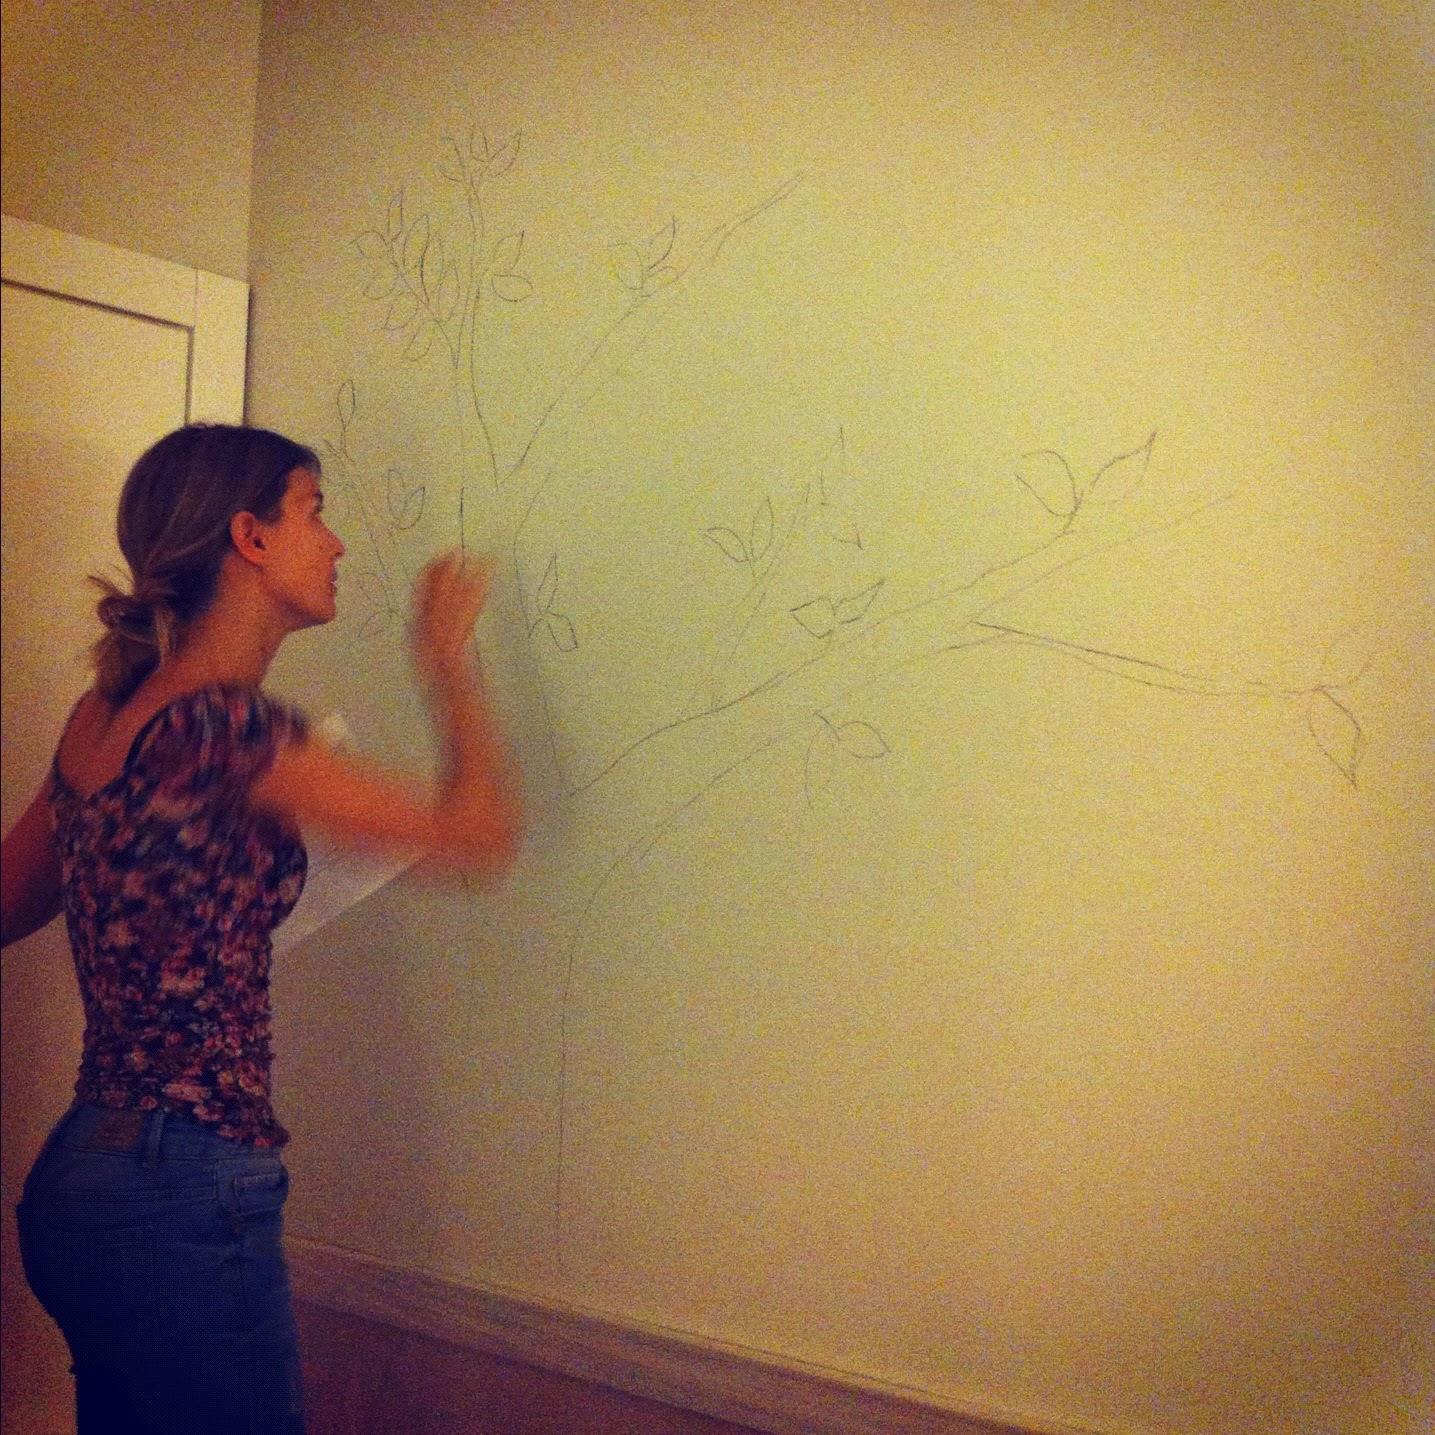 Como dibujar mural infantil for Como dibujar un mural en la pared